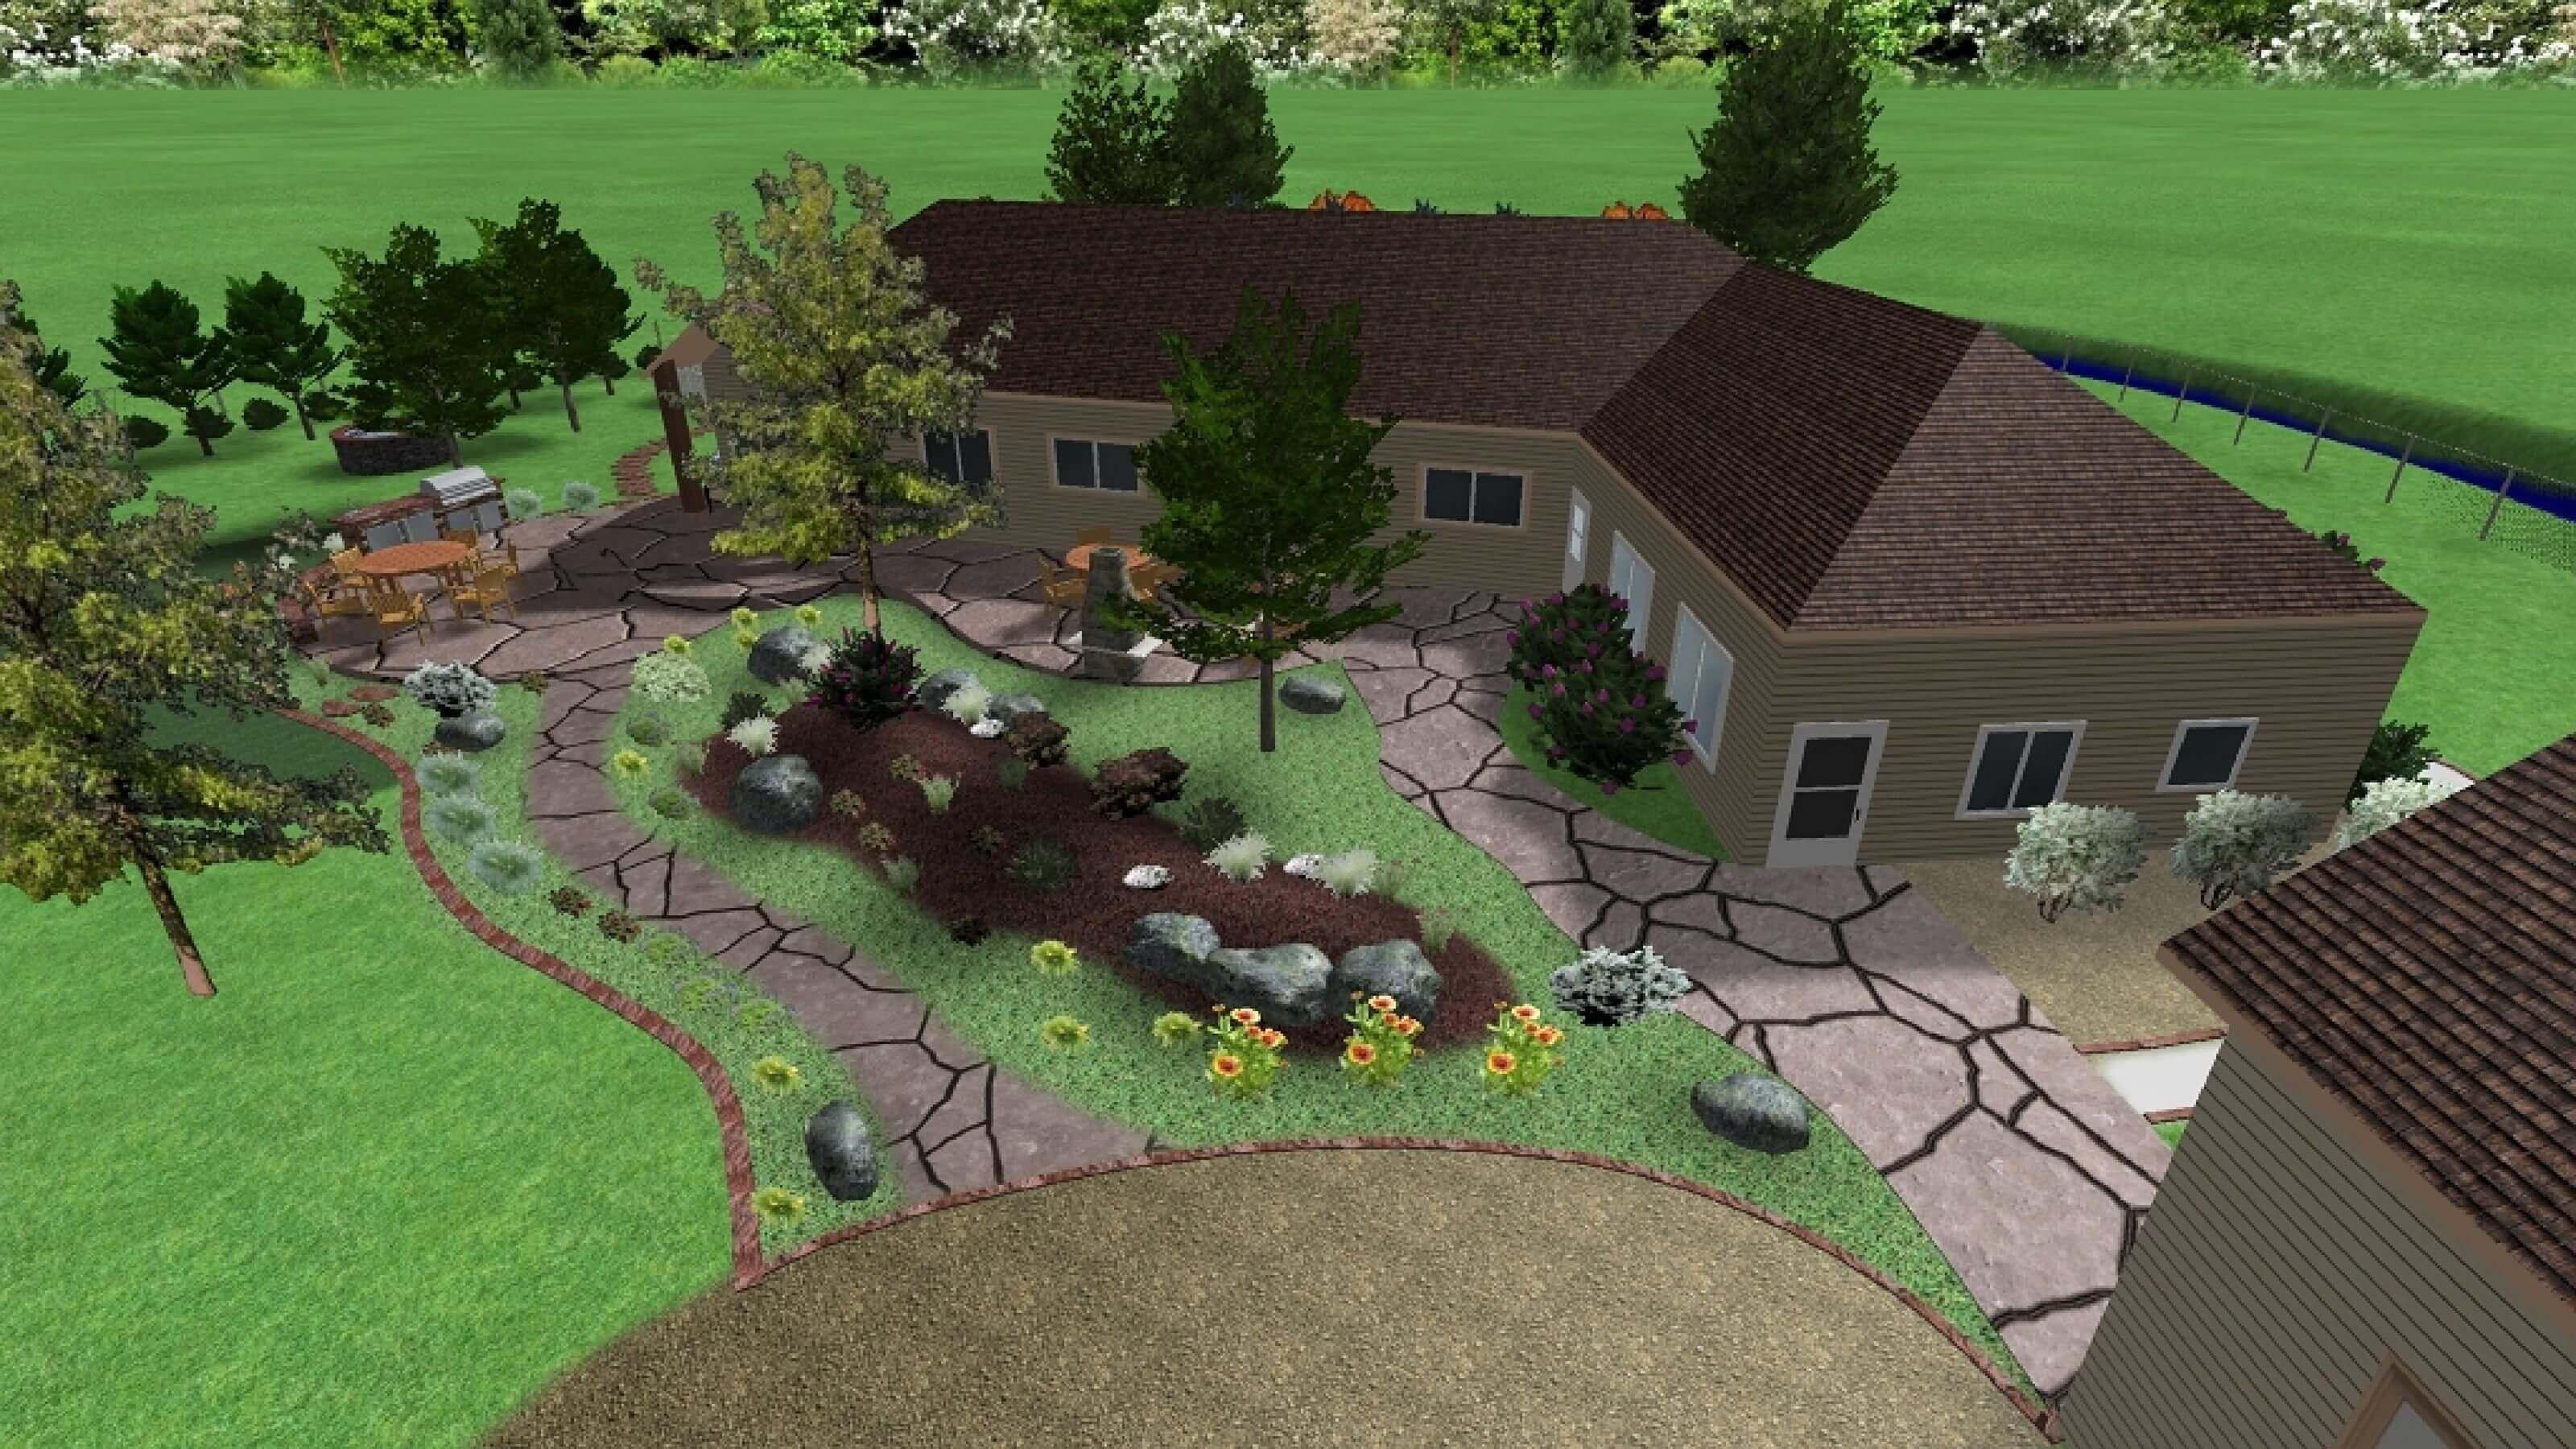 Pin By Online Landscape Designs On Landscape Designs Landscape Design Services Landscape Design Online Landscape Design